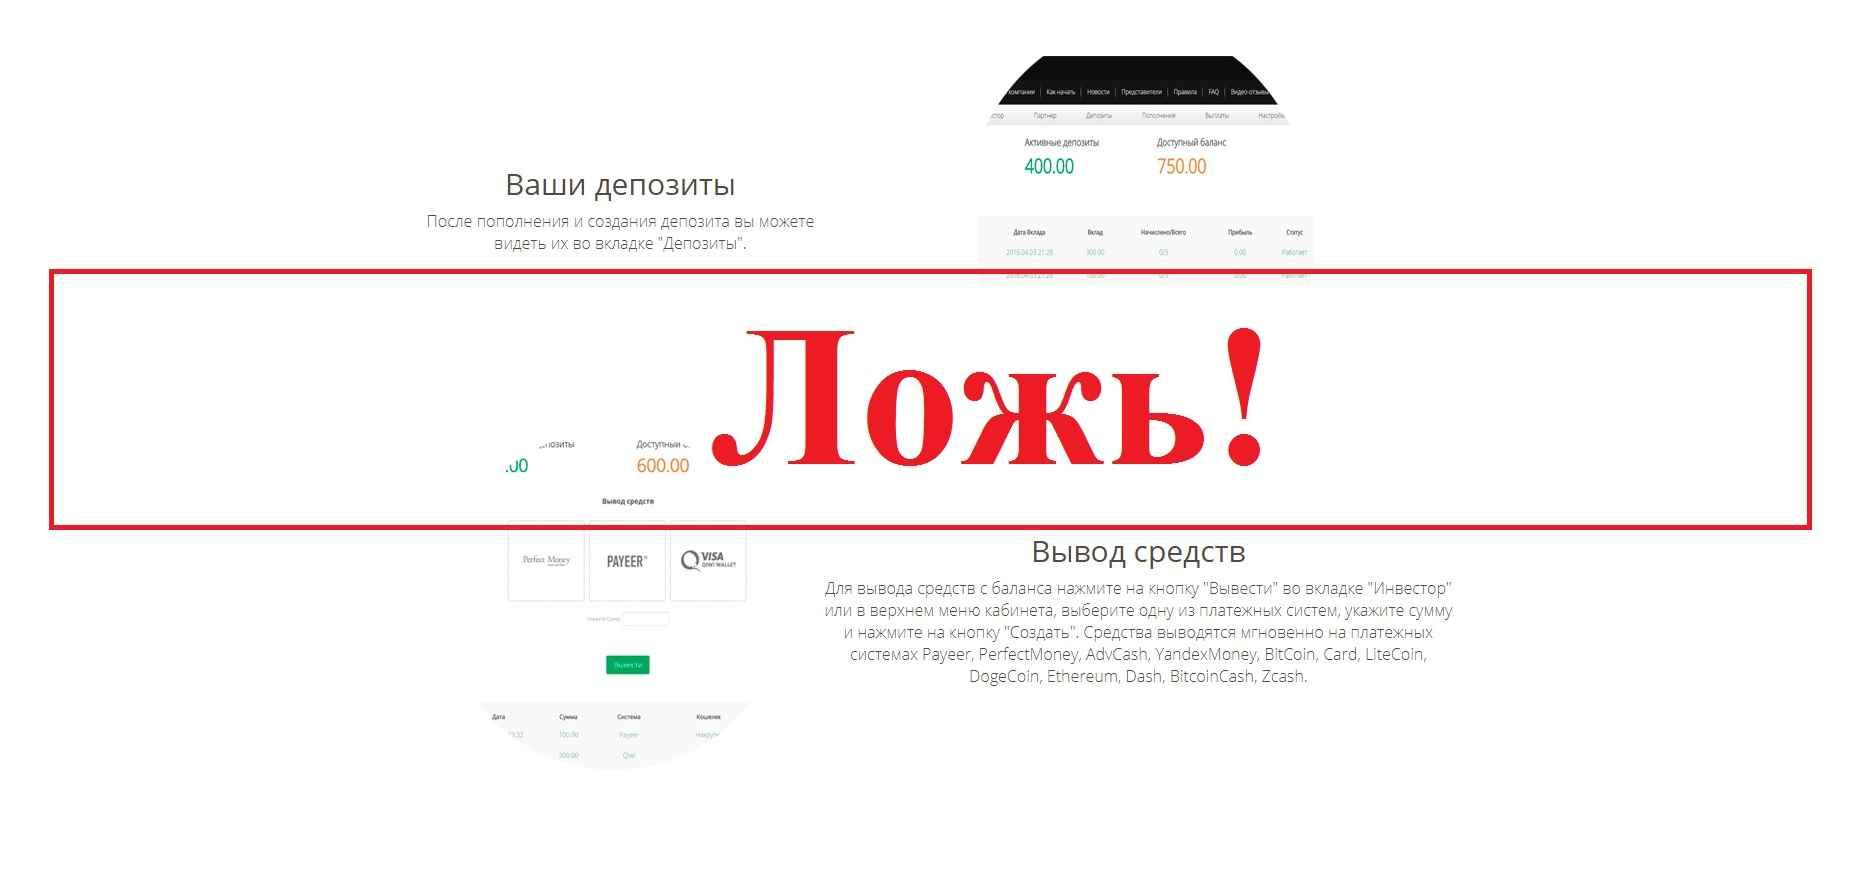 ForexExpert - инвестиционный сервис. Реальные отзывы о forexexpert.me